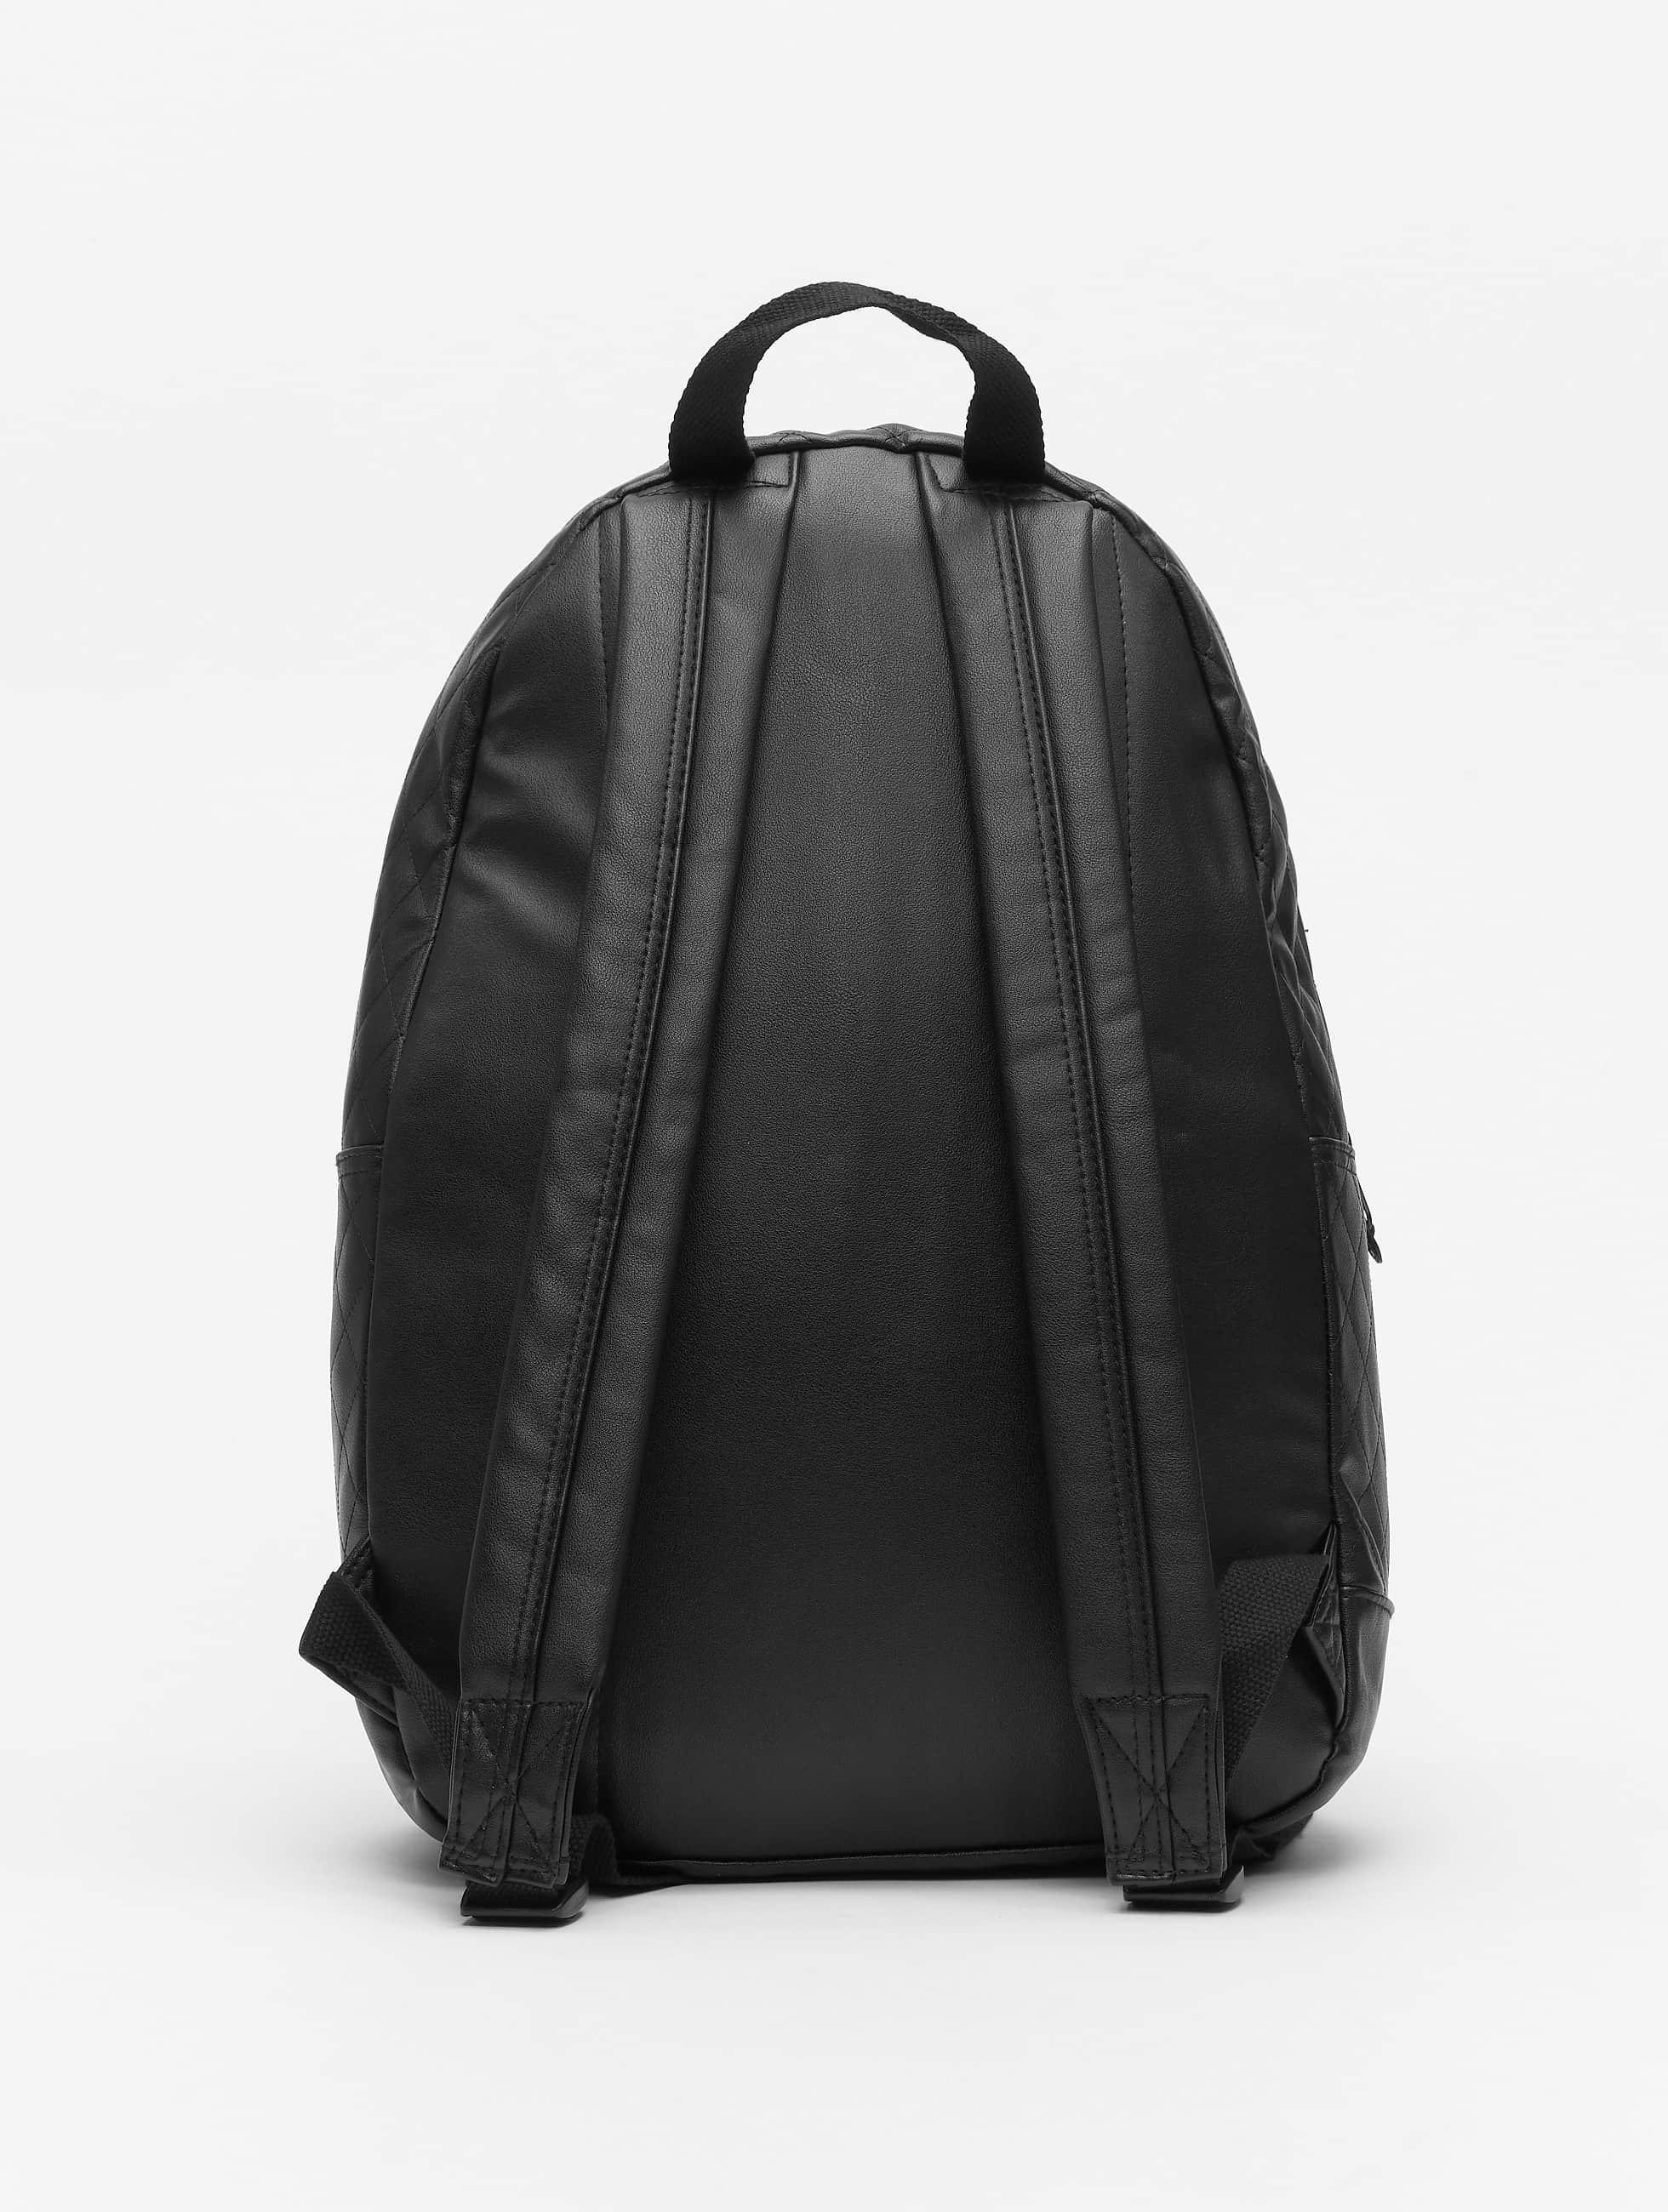 Urban Classics Sac à Dos Diamond Quilt Leather Imitation noir